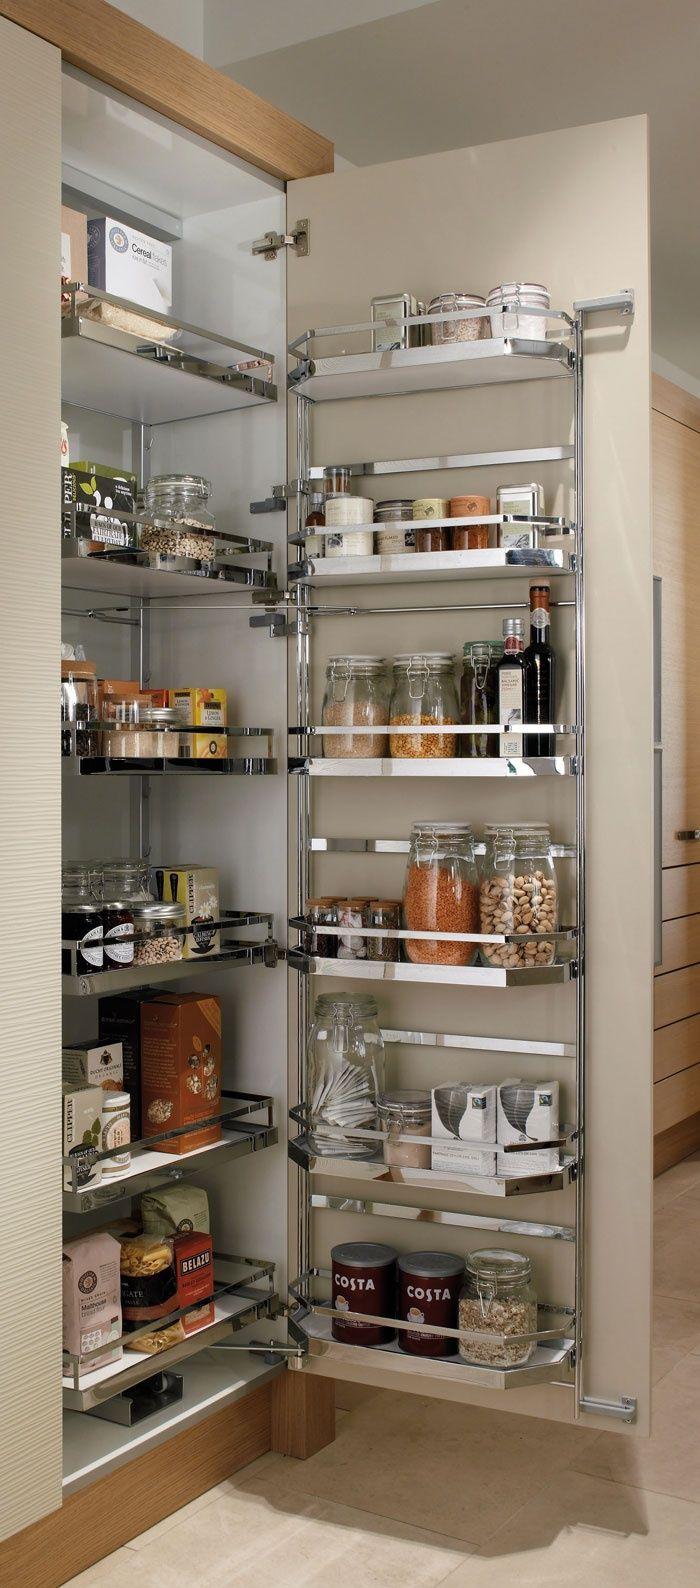 31 Amazing Storage Ideas For Small Kitchens | Kitchen ...